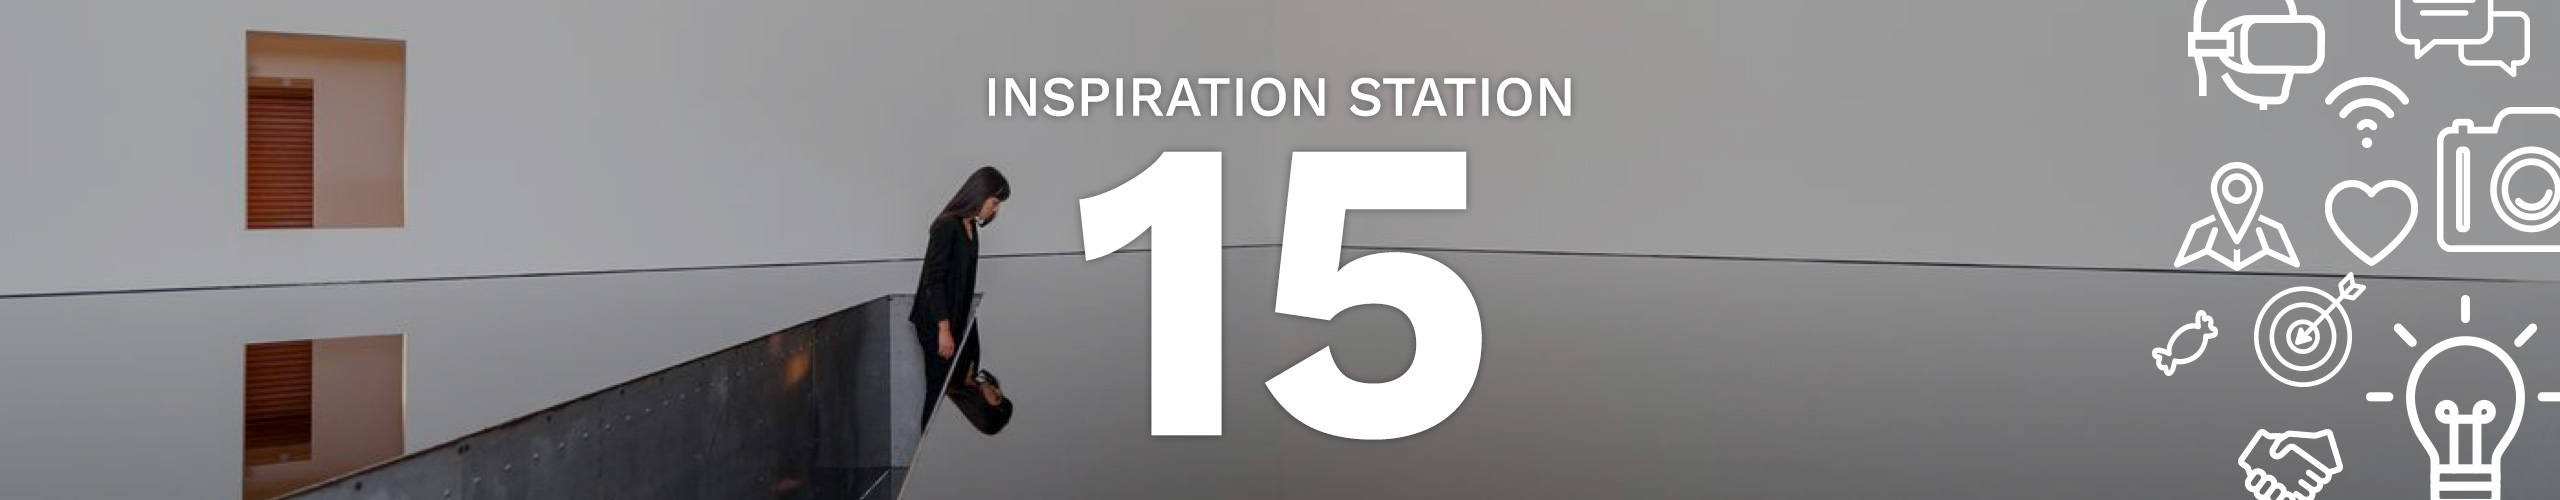 Inspiration Station <br/>Vol. 15